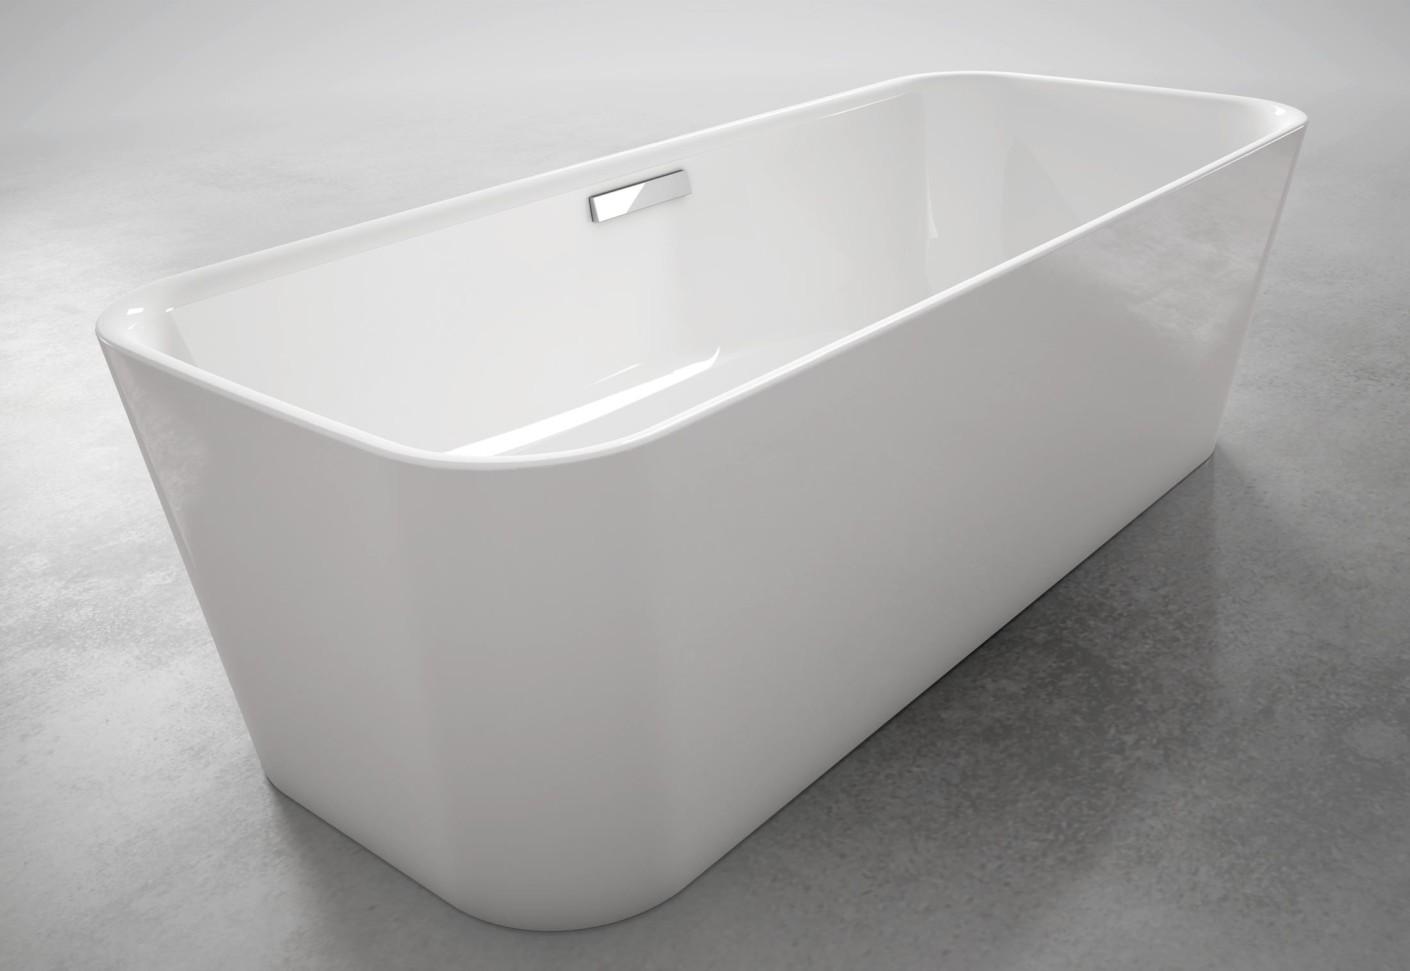 betteart badewanne von bette stylepark. Black Bedroom Furniture Sets. Home Design Ideas